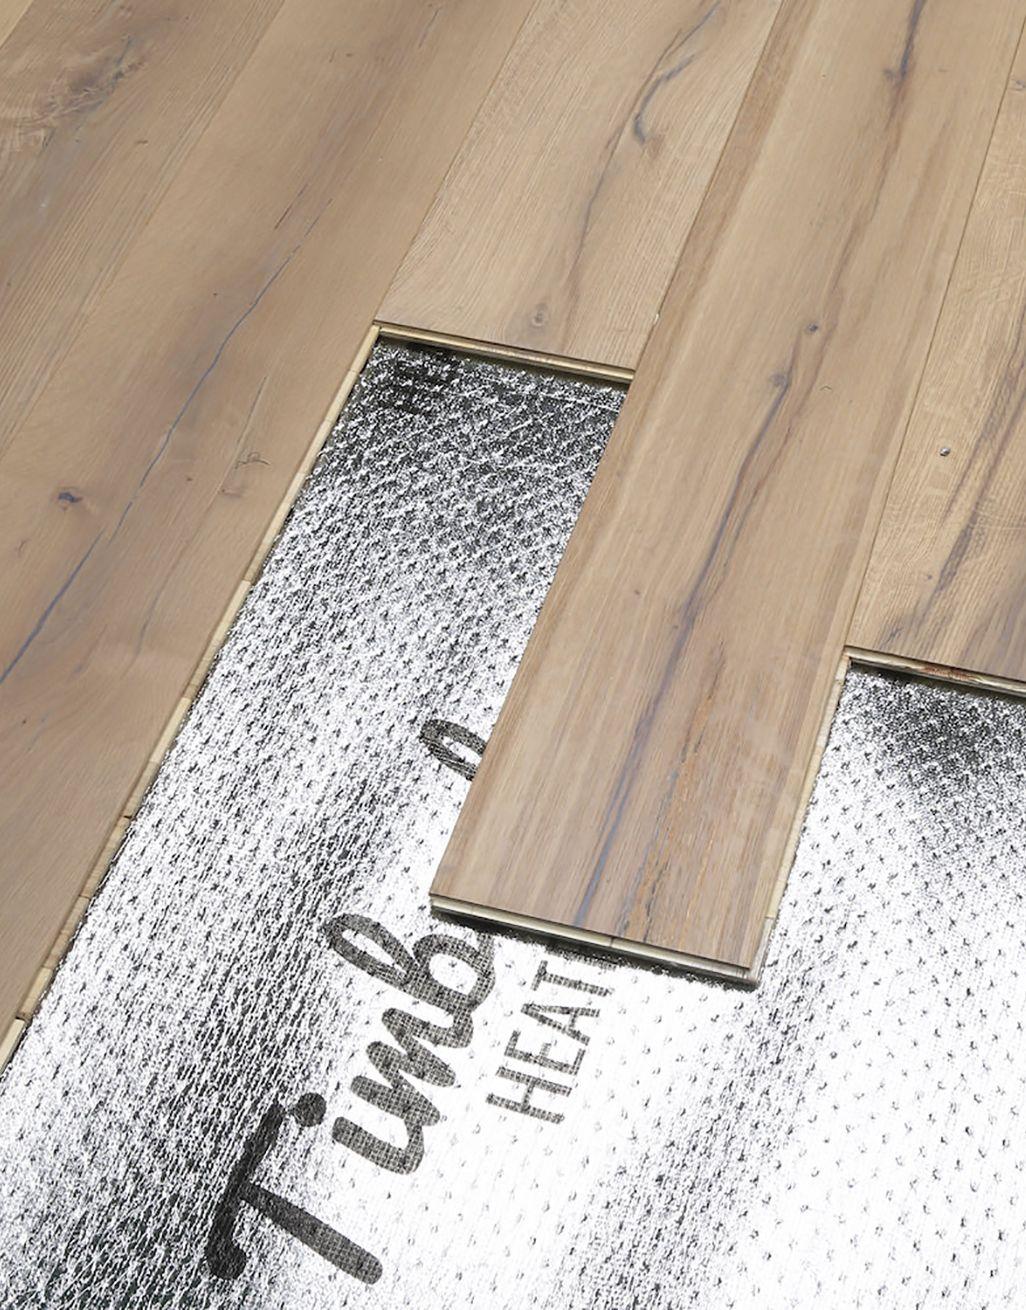 Timberlay Heatflow Underlay Flooring, Is It Necessary To Use Underlay For Laminate Flooring